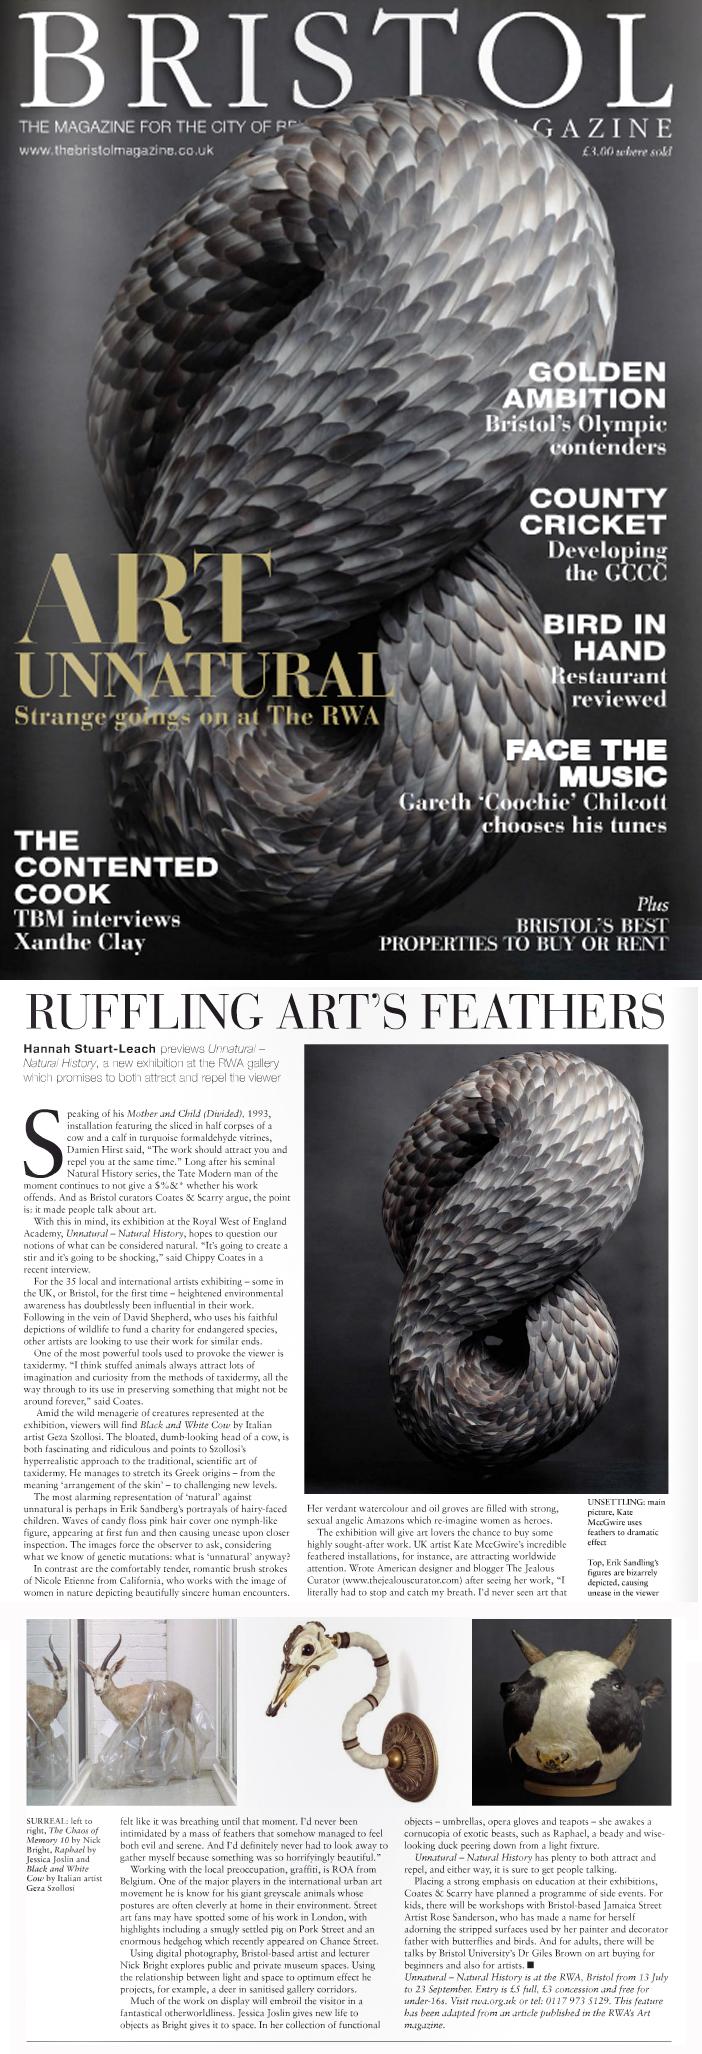 Bristol Magazine, 2012 - Kate MccGwire